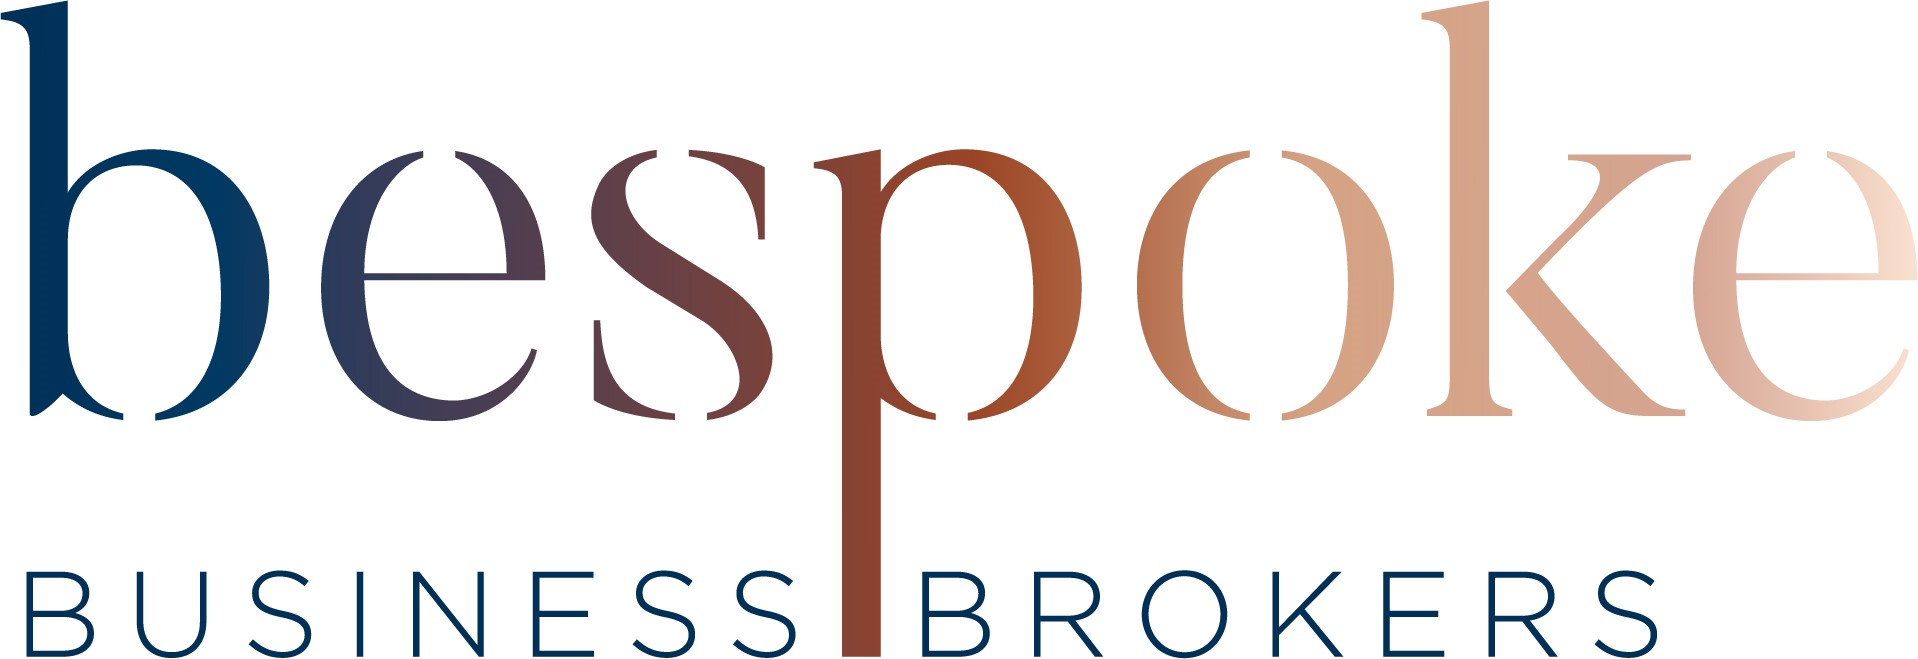 Bespoke Business Brokers Logo